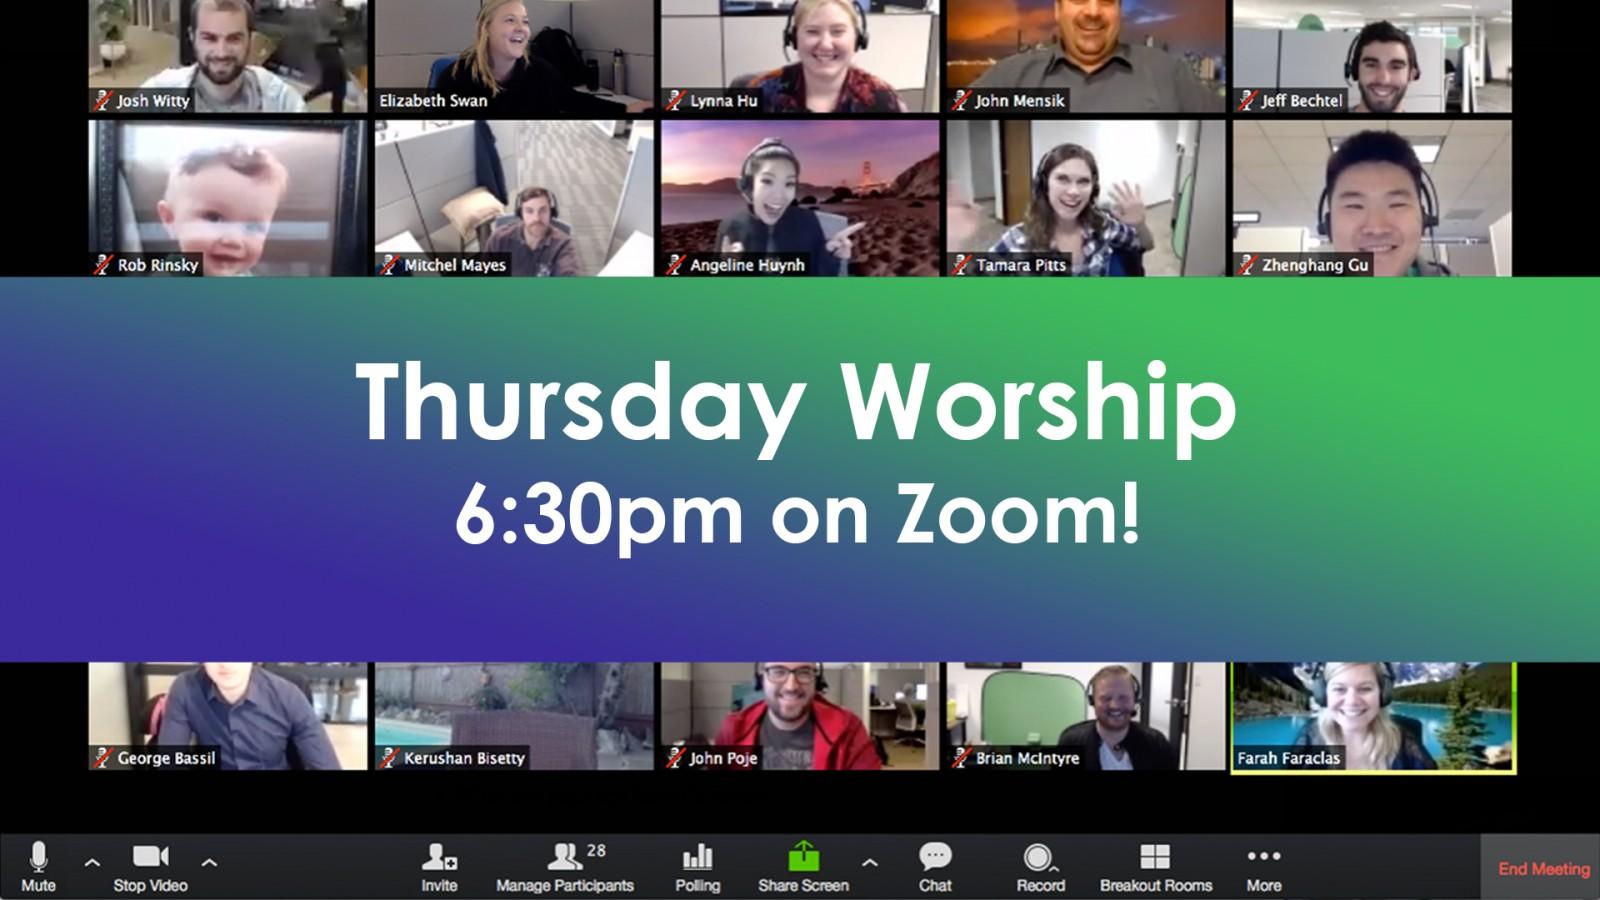 Thursday Worship on Zoom | no url - web2